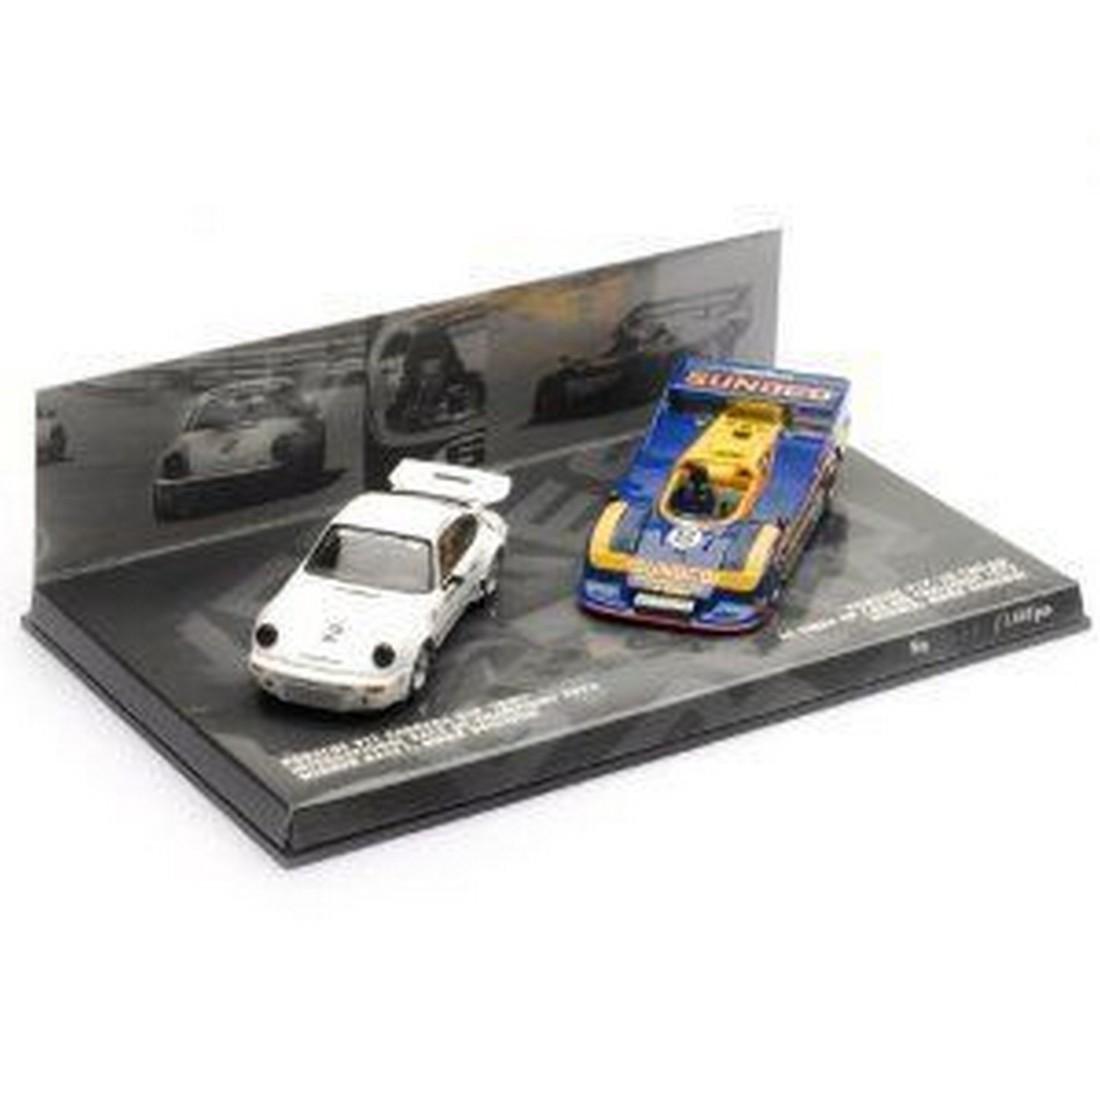 Minichamps Scale 1:43 Porsche 911 917 Mark Donohue 1973